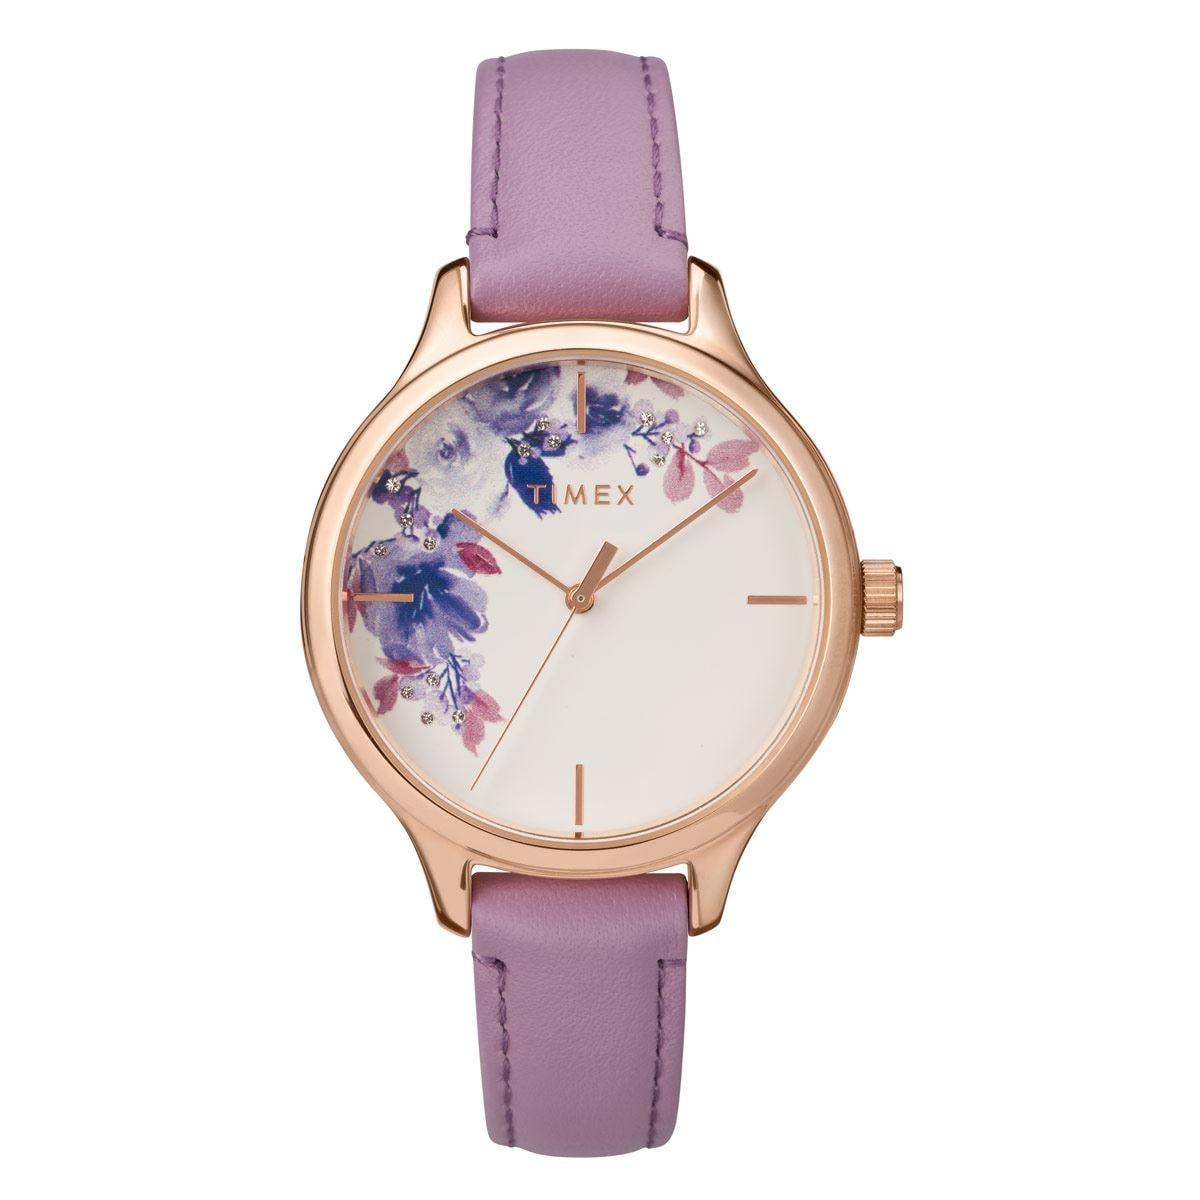 Reloj para Dama Timex Rosa y Blanco